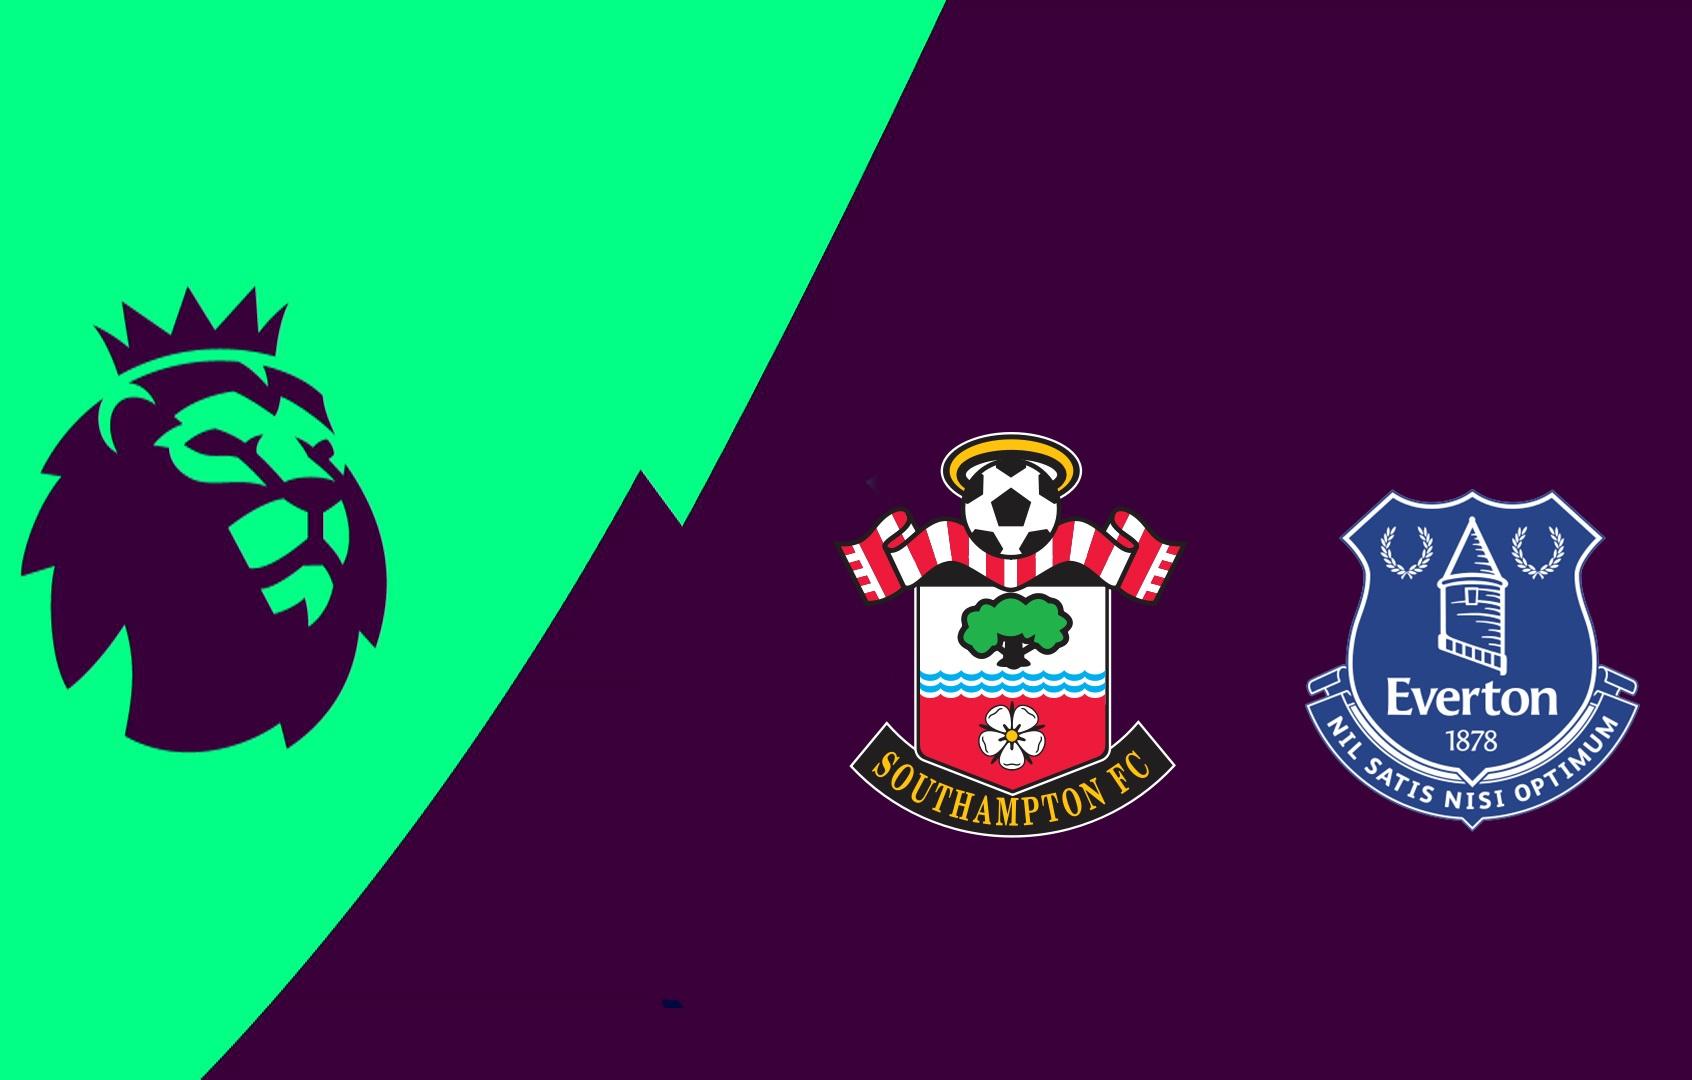 soi-keo-ca-cuoc-bong-da-ngay-7-11-Southampton-vs-club-brugge-lay-ve-di-tiep-b9 1